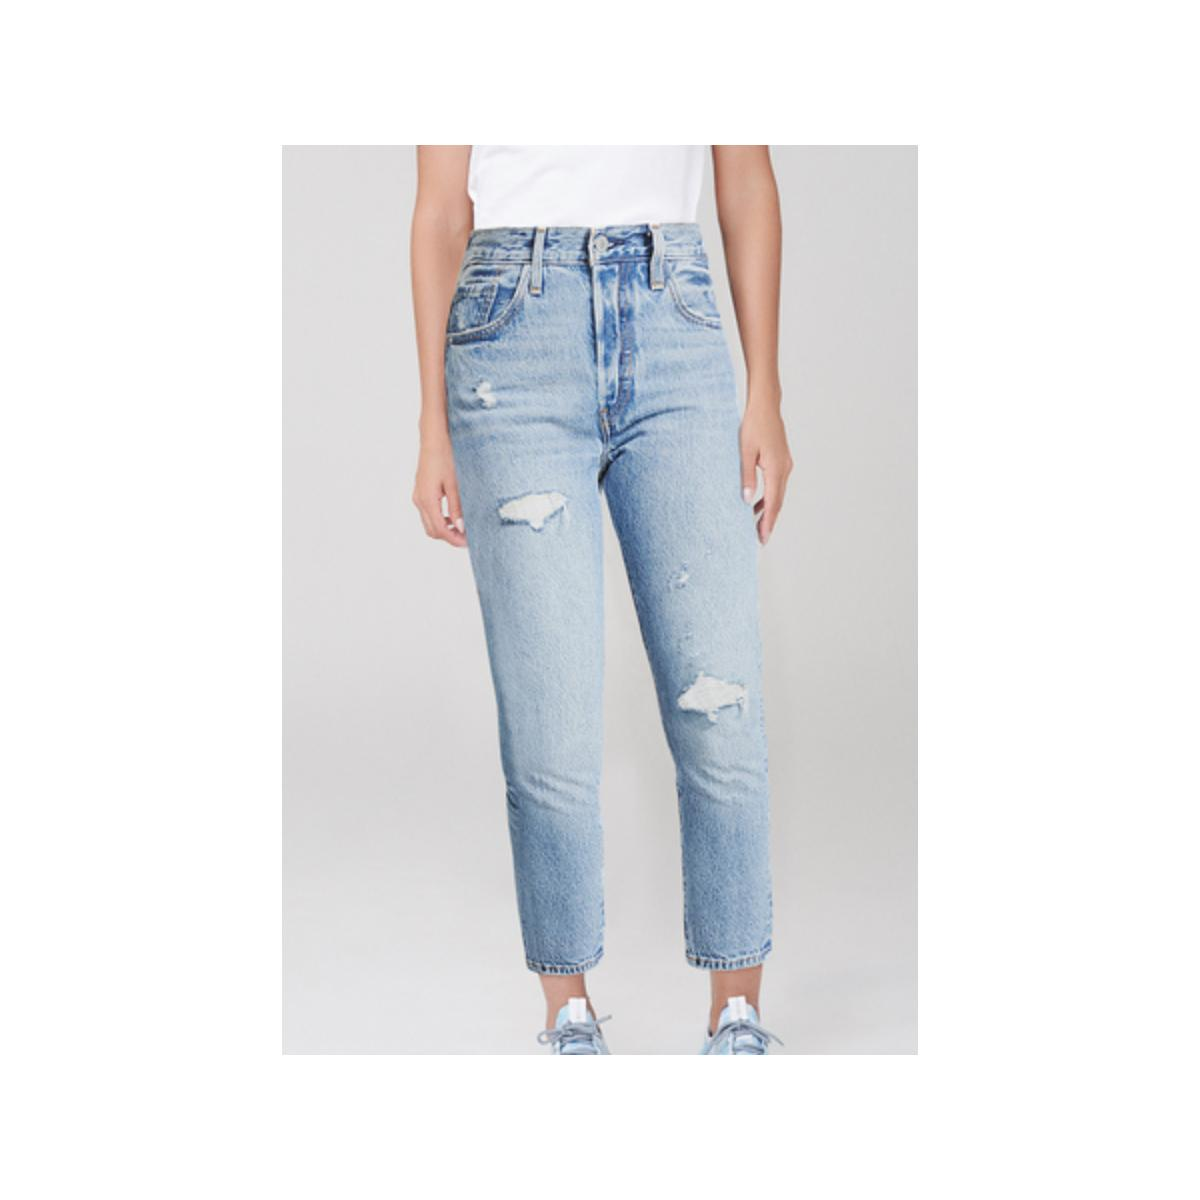 Calça Feminina Dzarm Z1r6 1csn  Jeans